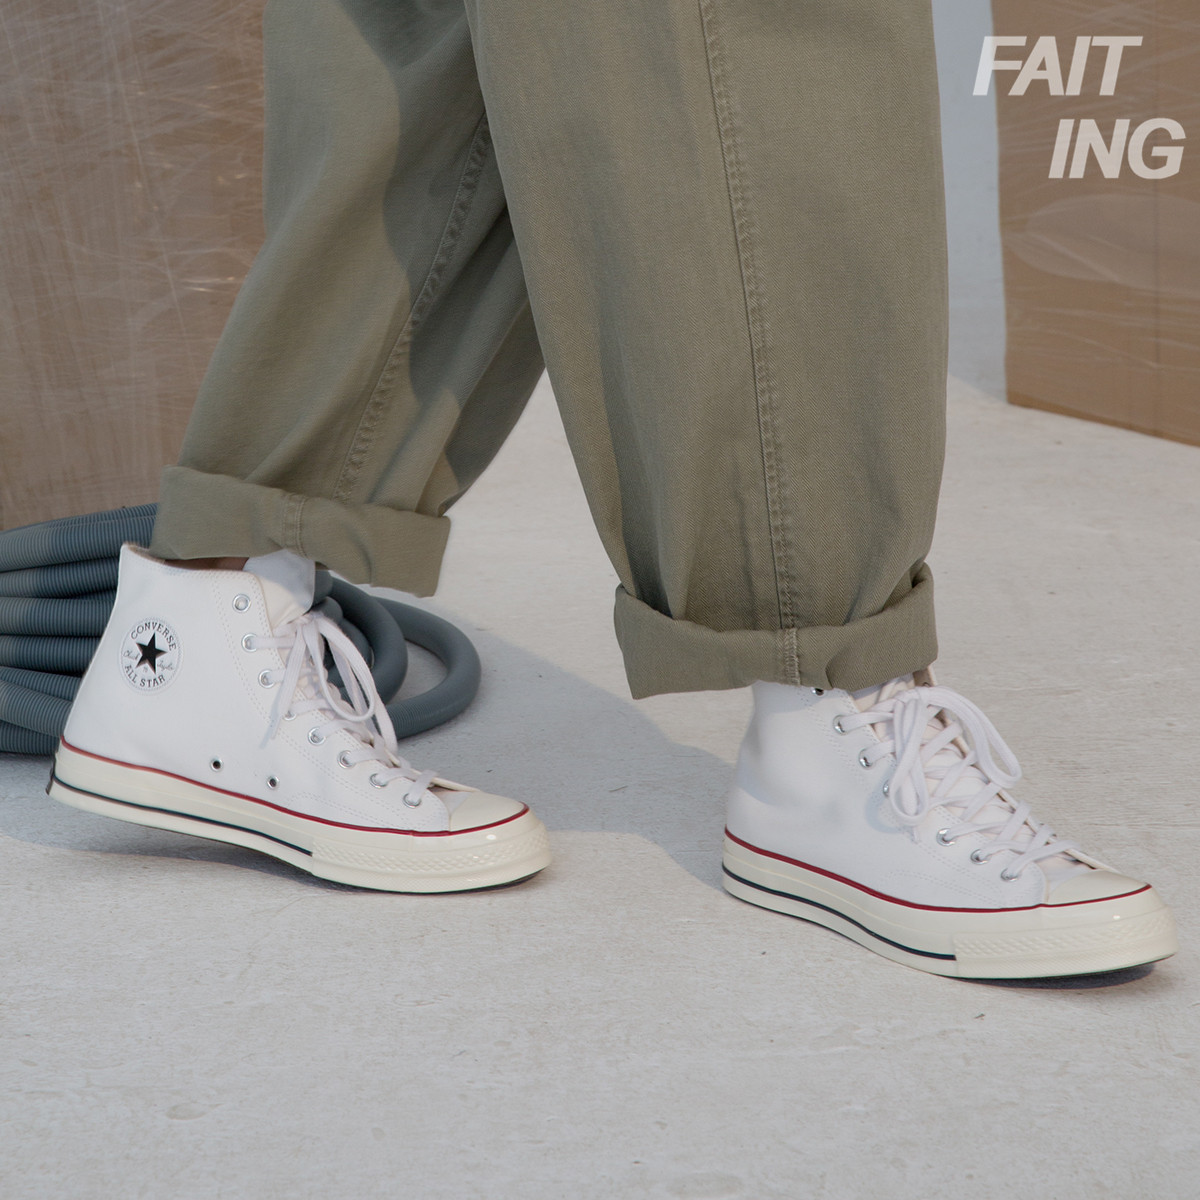 Converse匡威1970s白高帮白色低三星标男女帆布鞋162056c 162065C